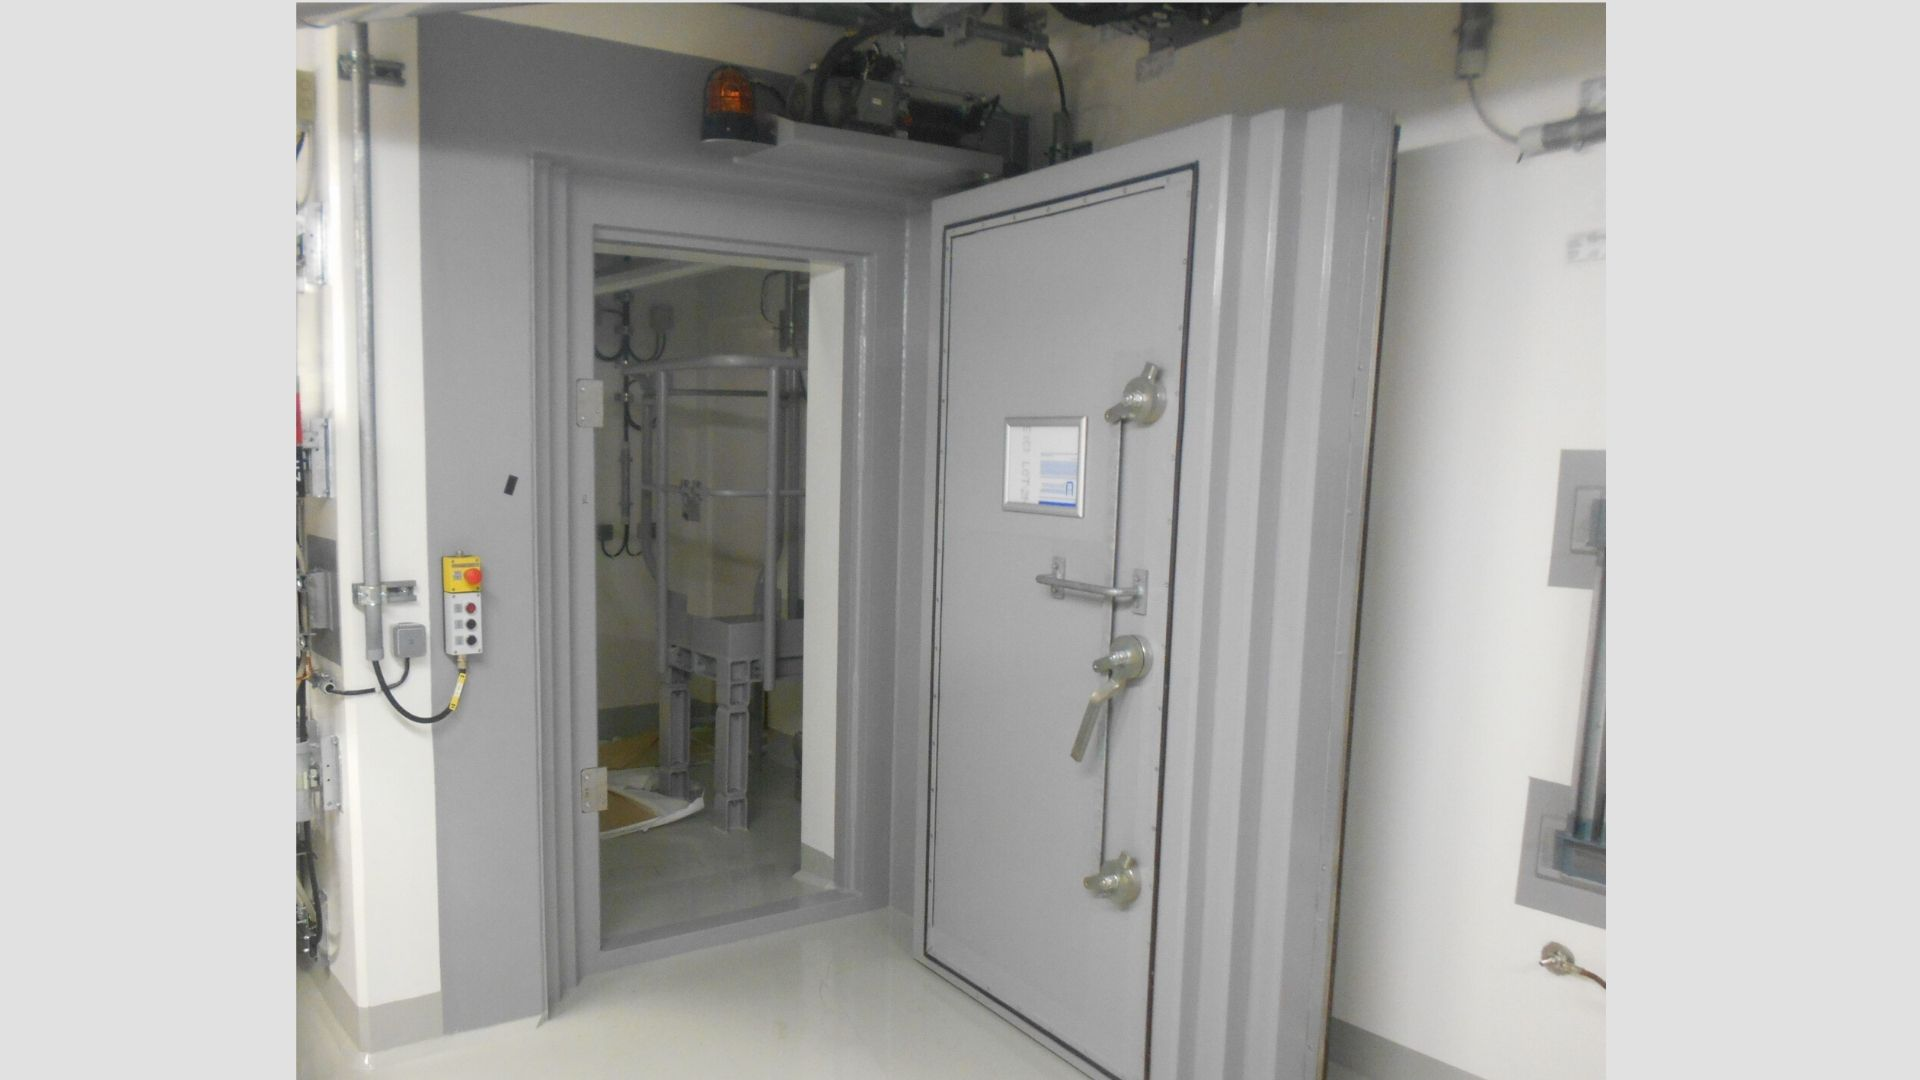 Neutron and gamma rays protection door -Neutronic